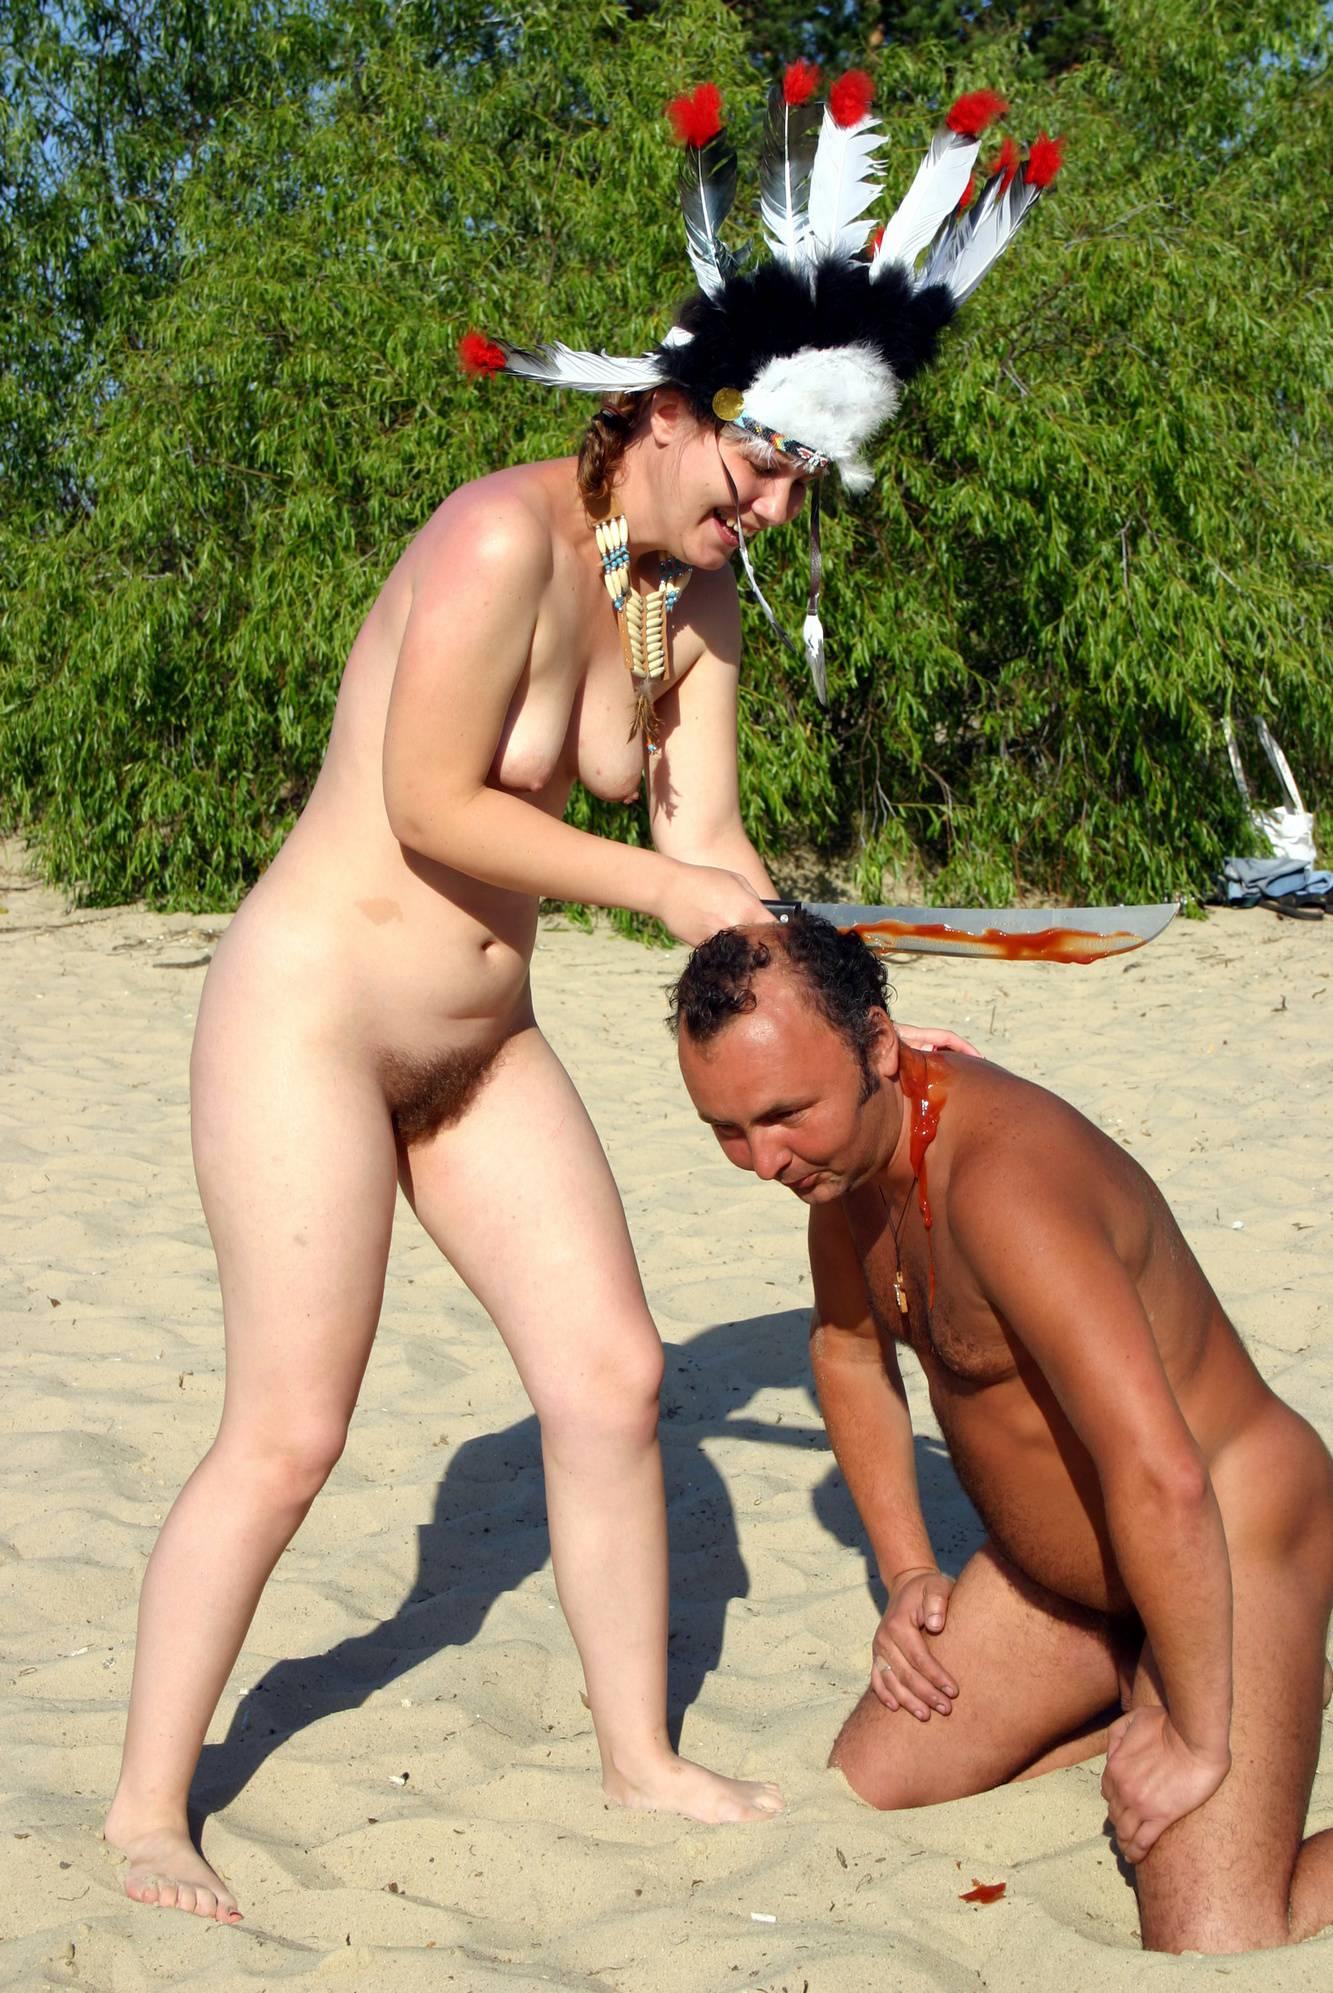 Nude Dress Battles Begin - 2